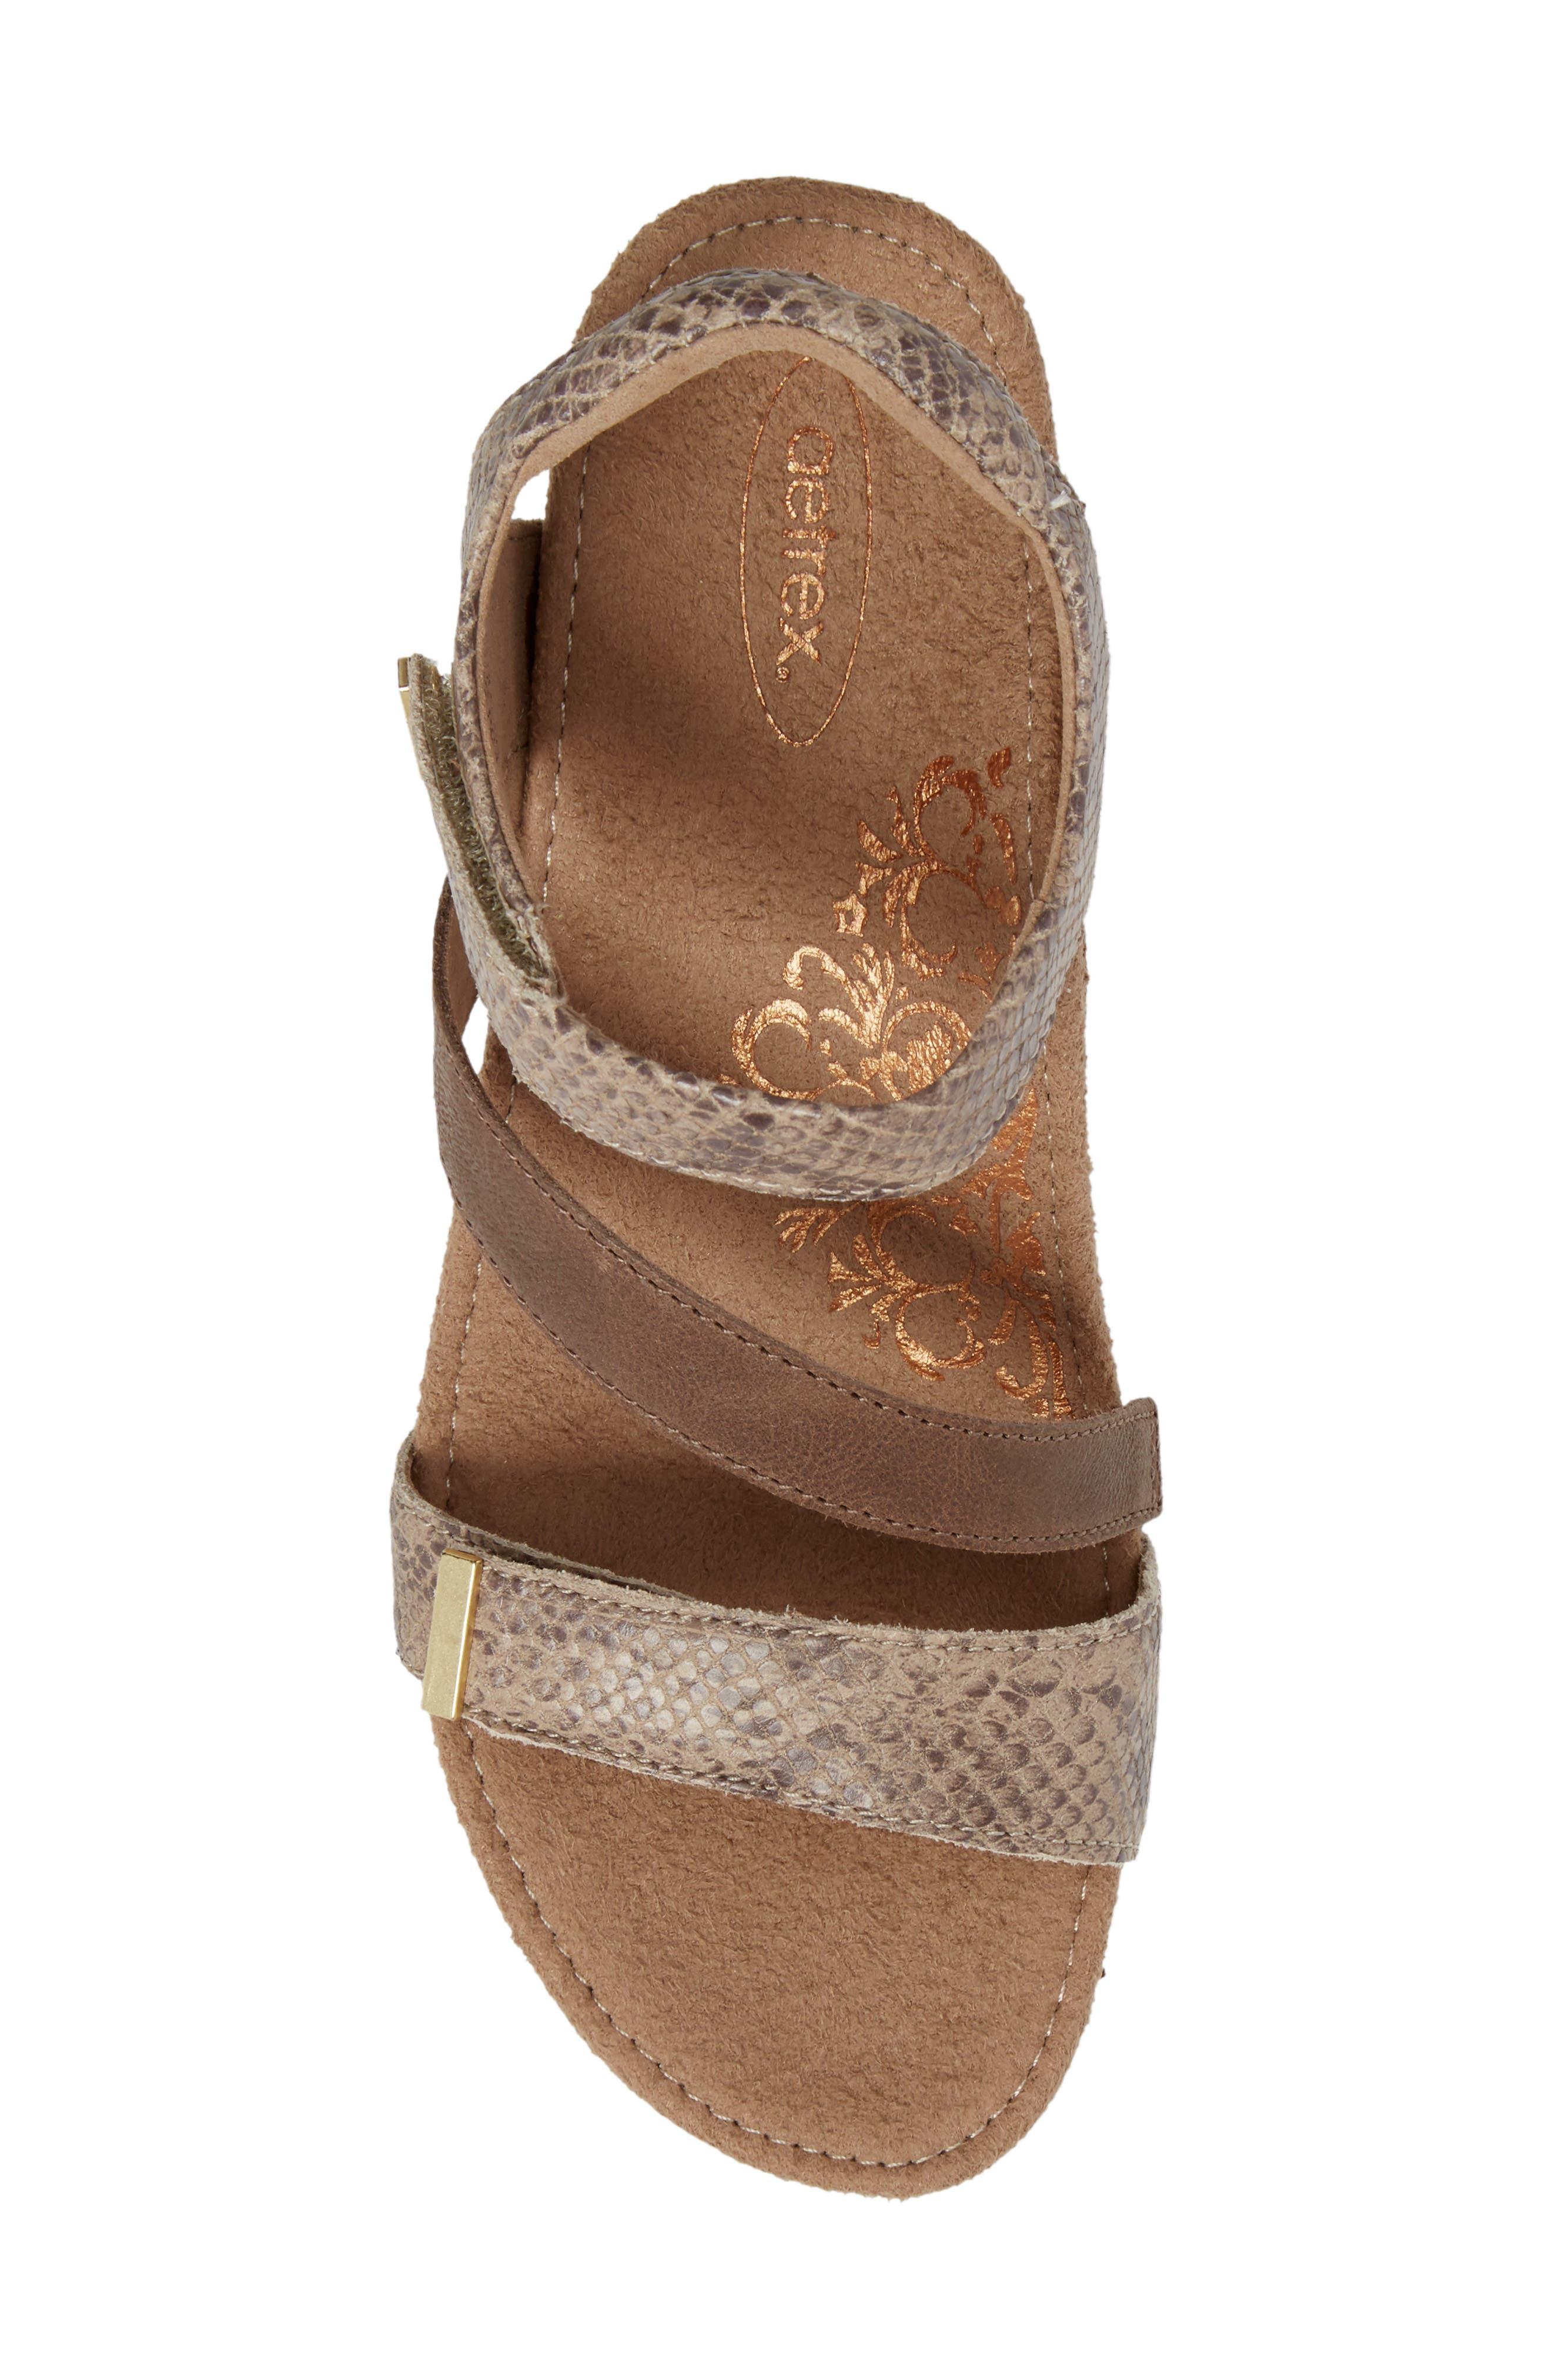 Brynn Asymmetrical Wedge Sandal,                             Alternate thumbnail 5, color,                             STONE SNAKE LEATHER